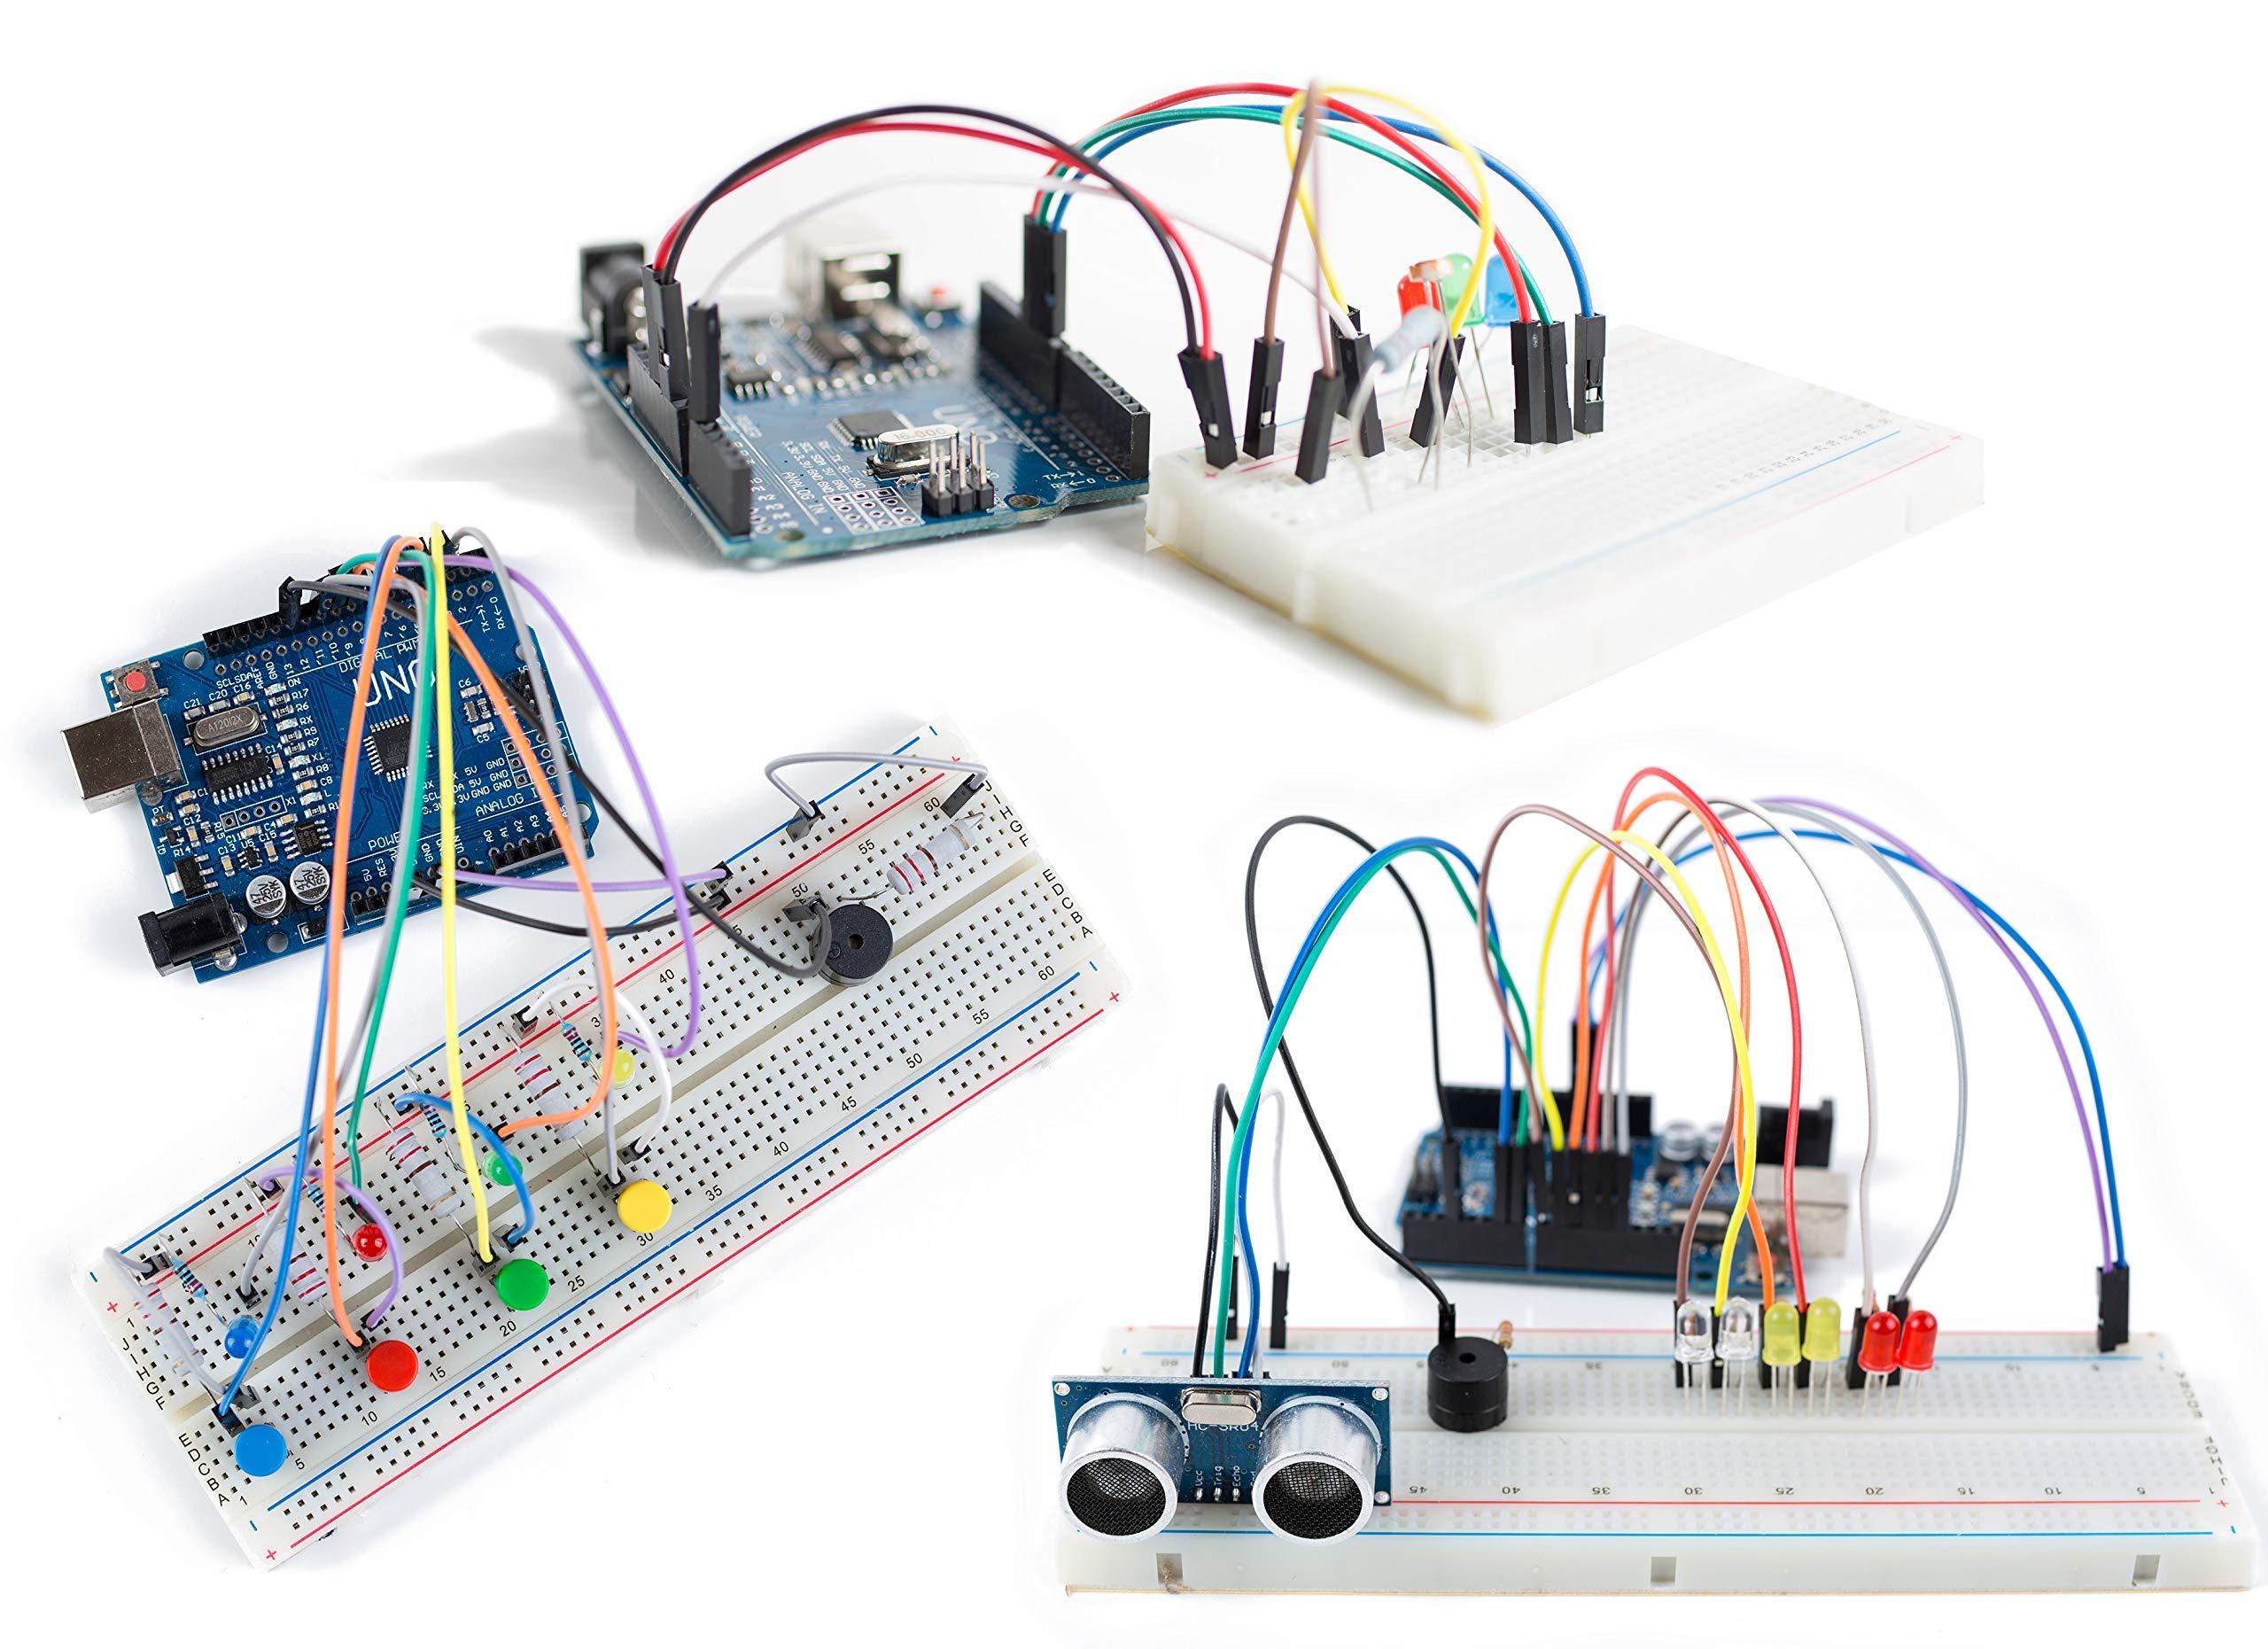 Arduino Uno R3 Kit CREATION CRATE (7RB2VXDD)